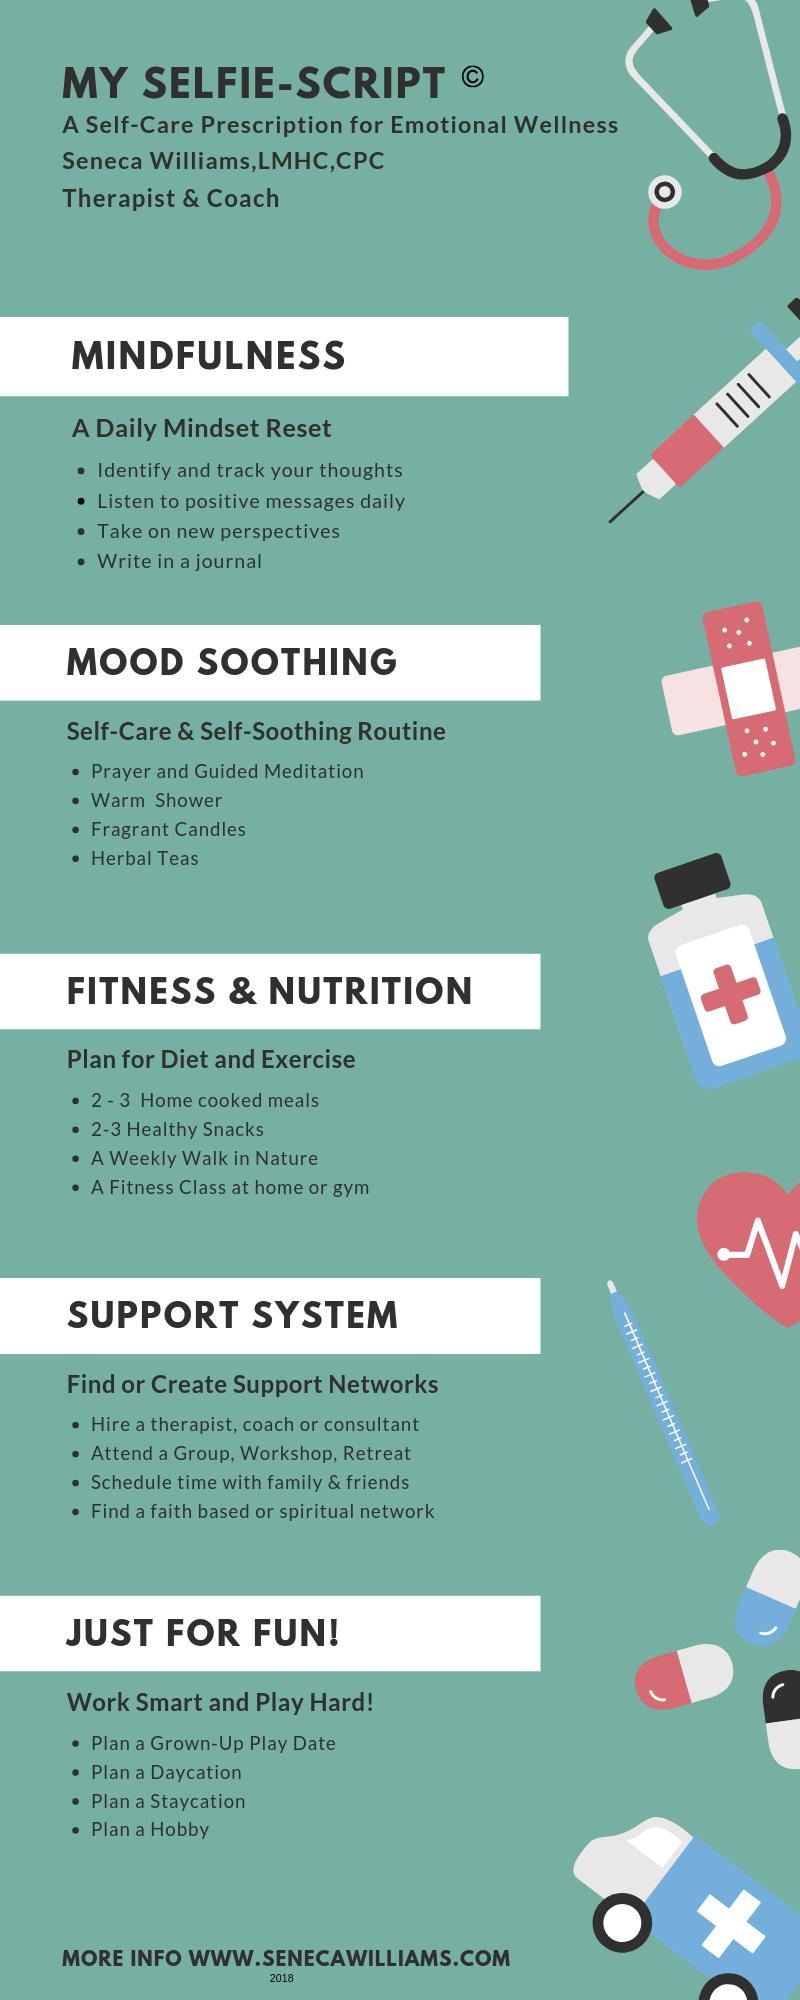 Self-Script Self Care Prescription .png